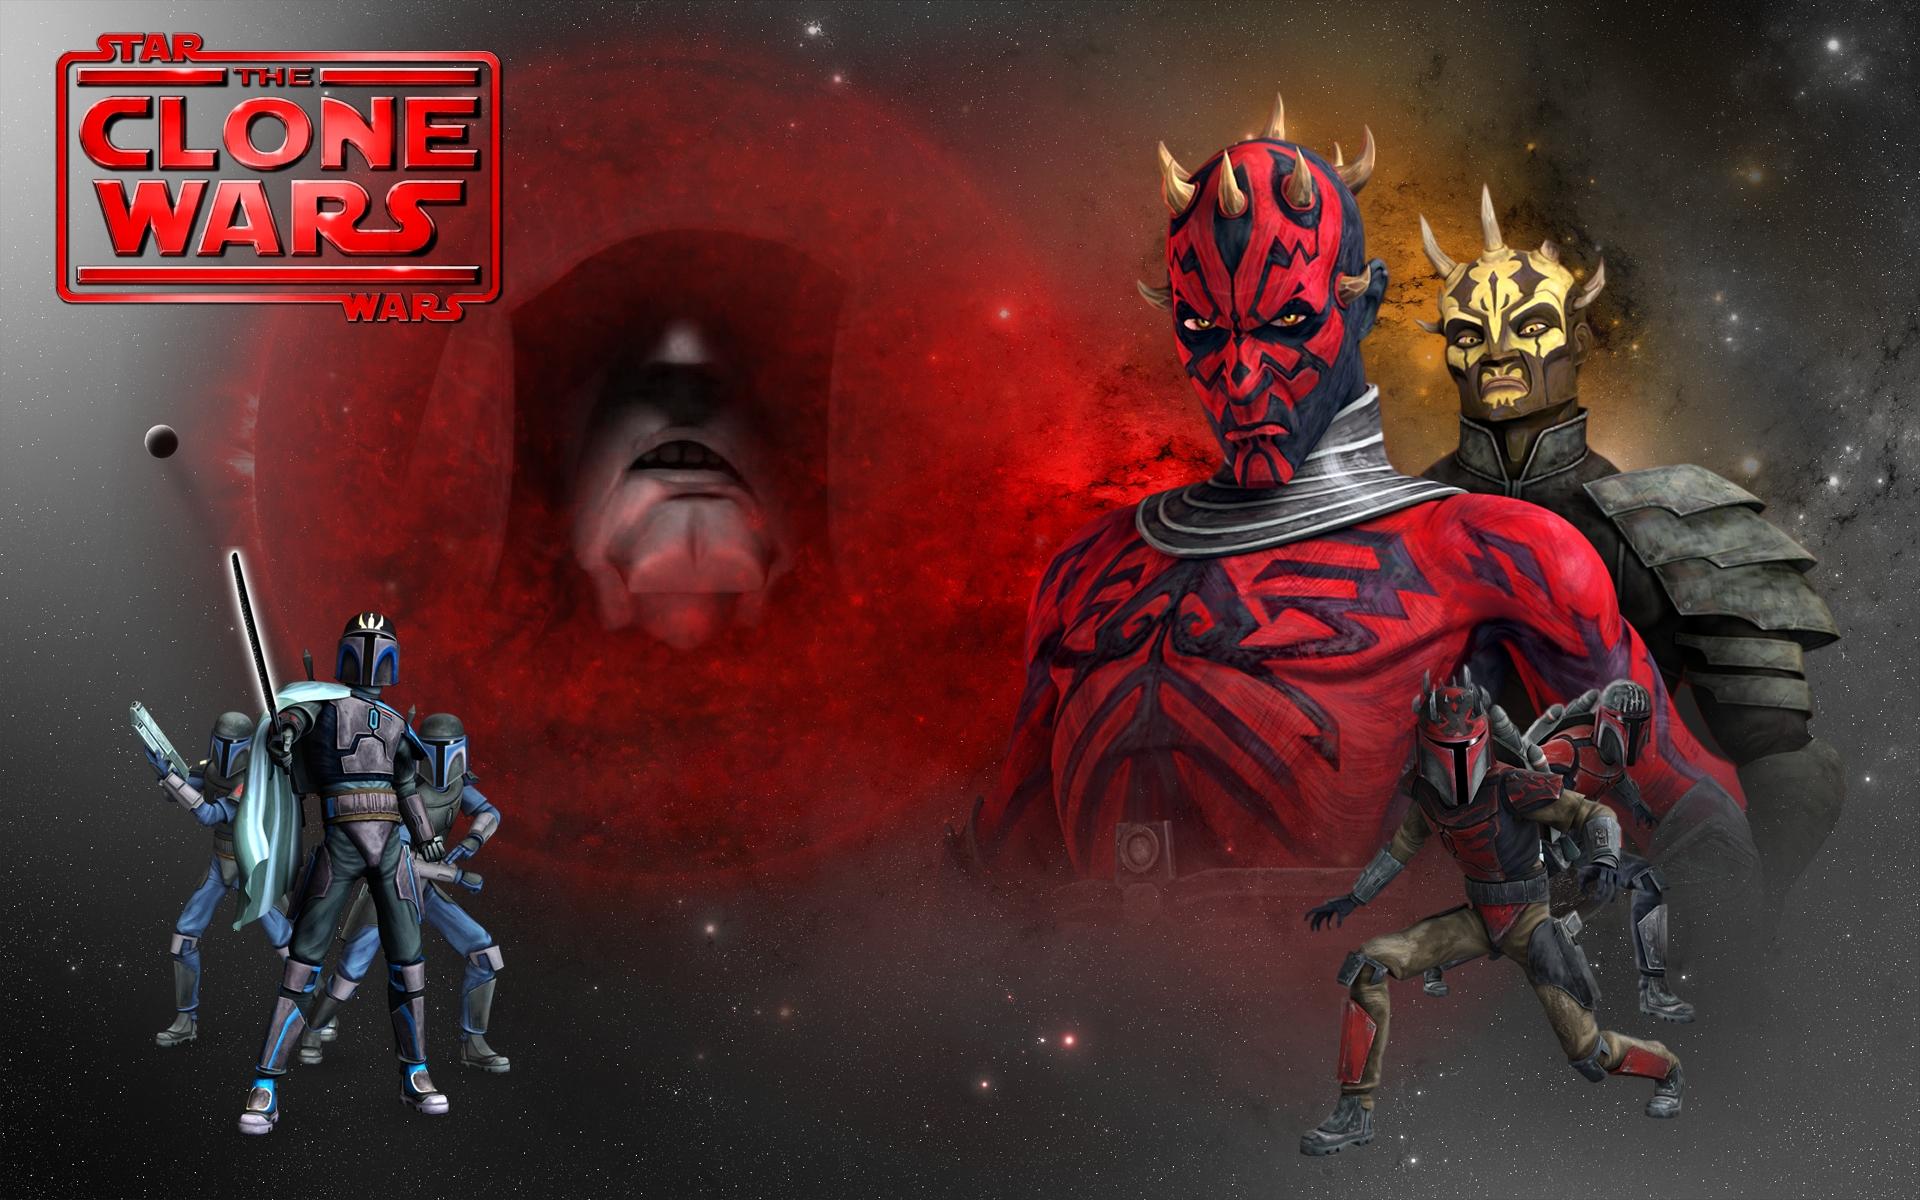 Clone Wars Maul Savage Wallpaper By Lordradim On Deviantart